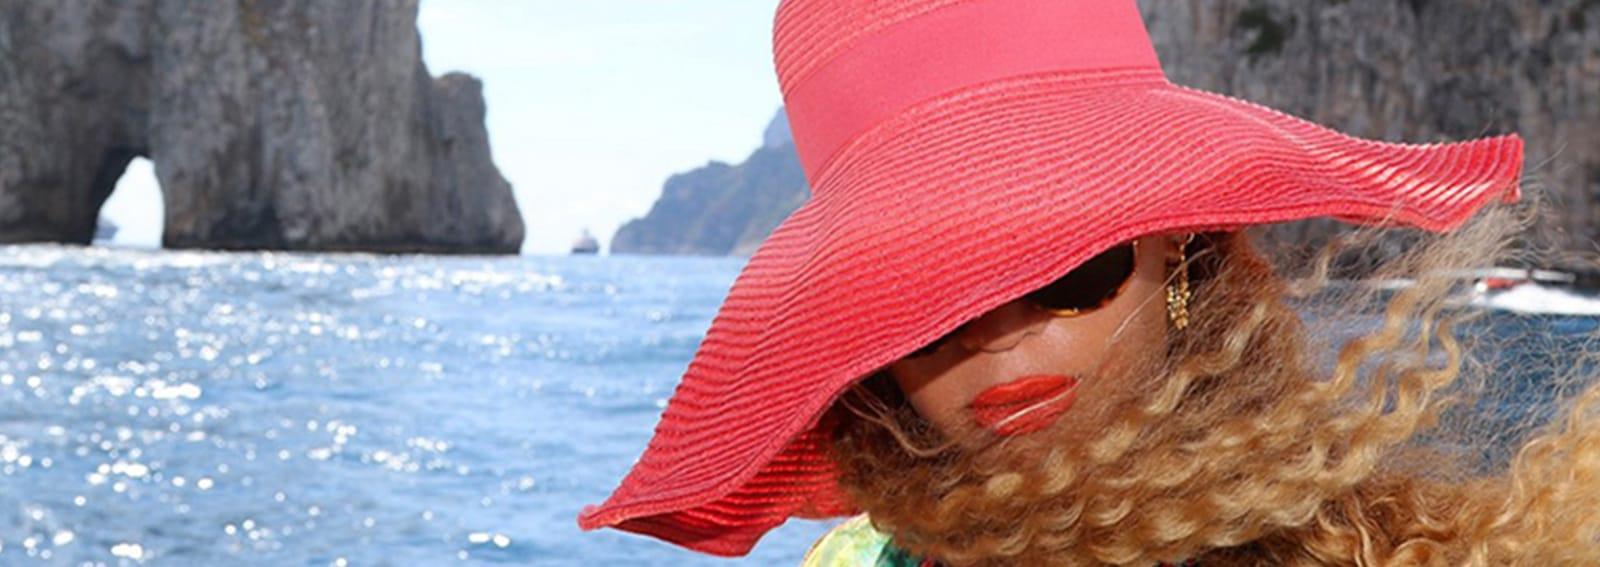 cover beyonce vacanza italia desktop